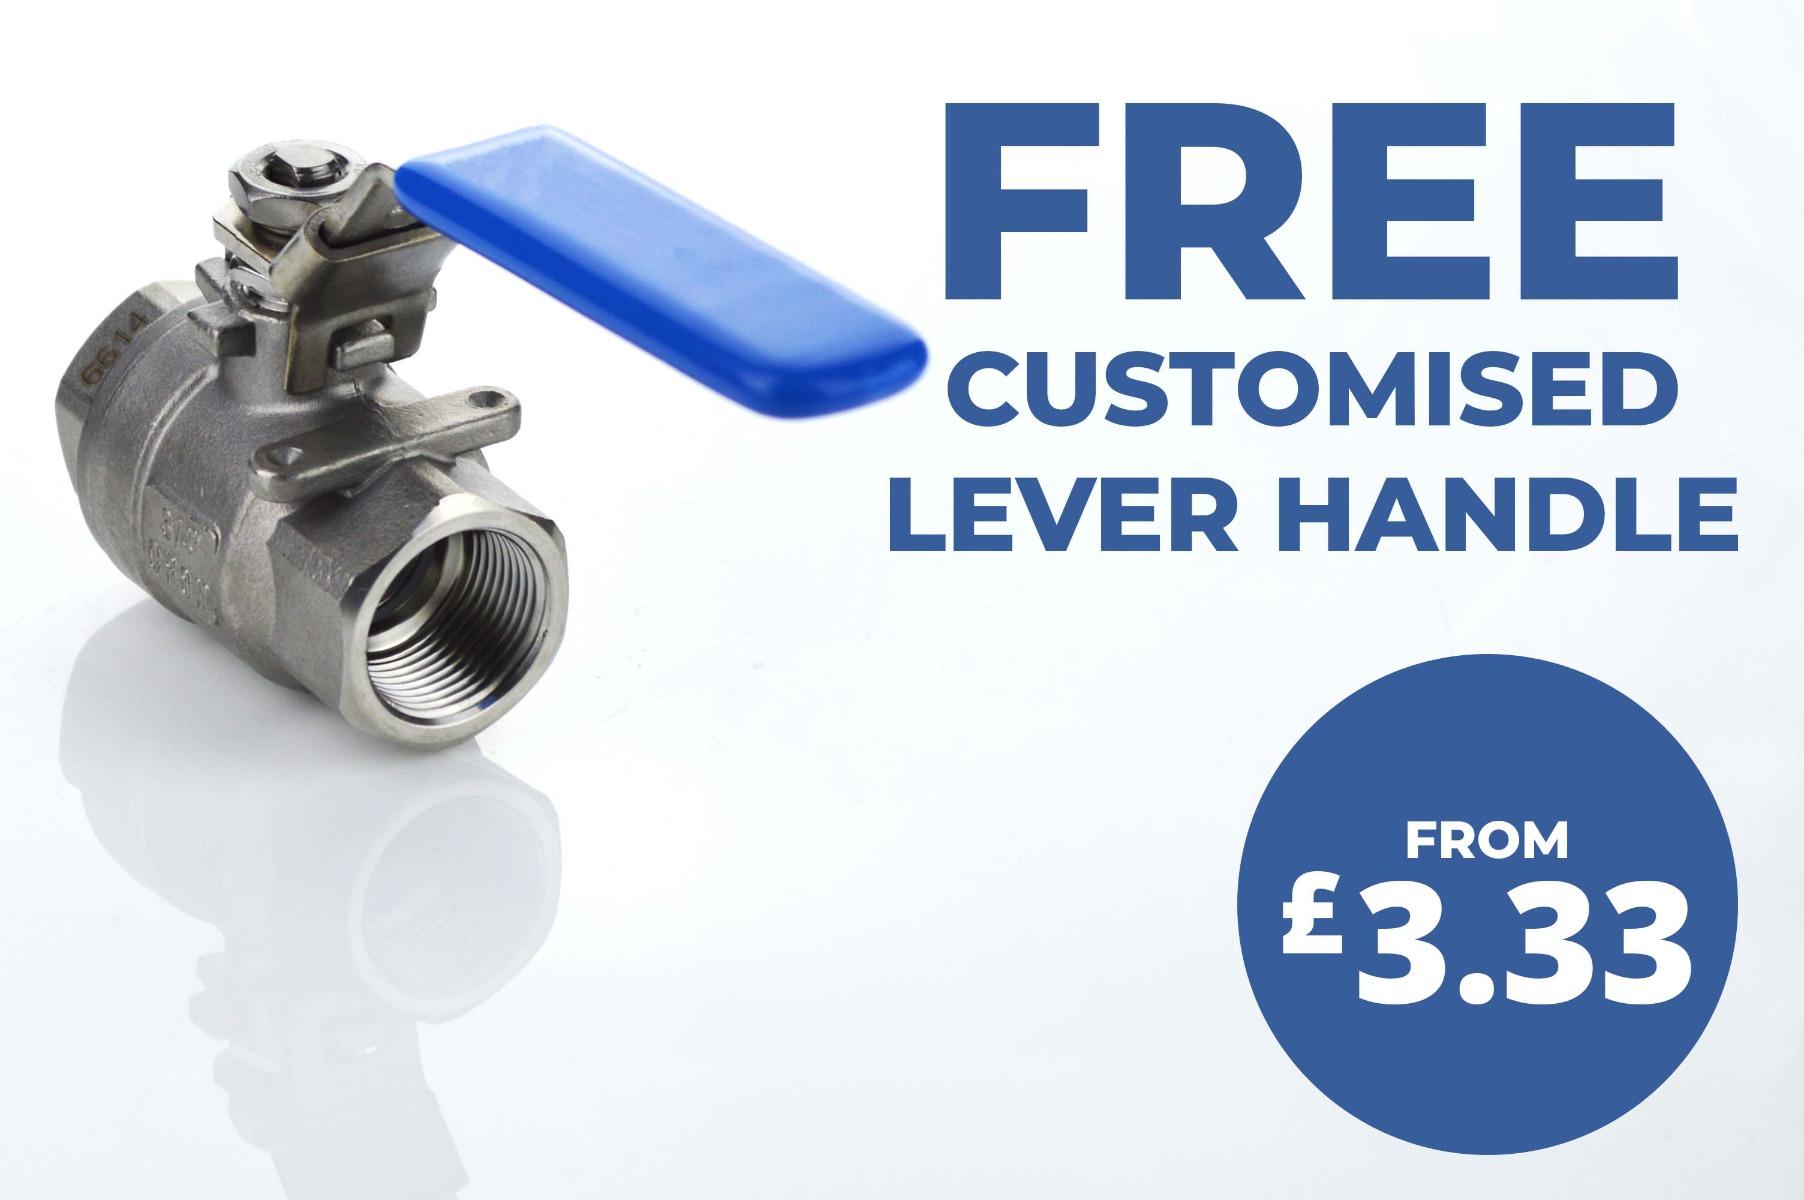 Free Customised Lever Handle